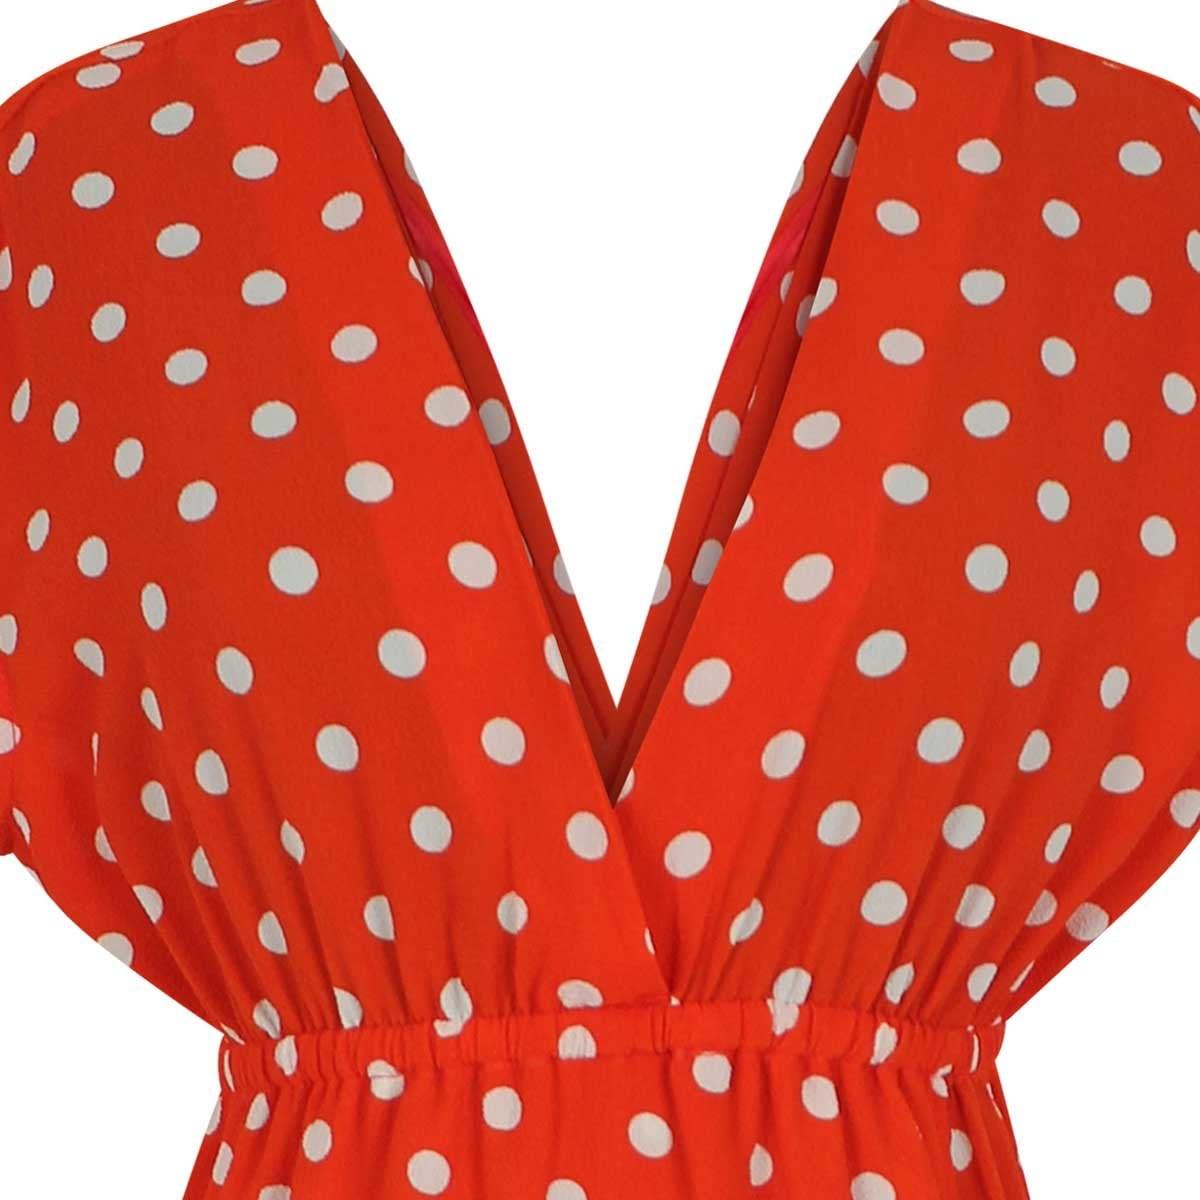 033f9b0245c0 Vestido naranja sin manga escote v estampado lunares elle